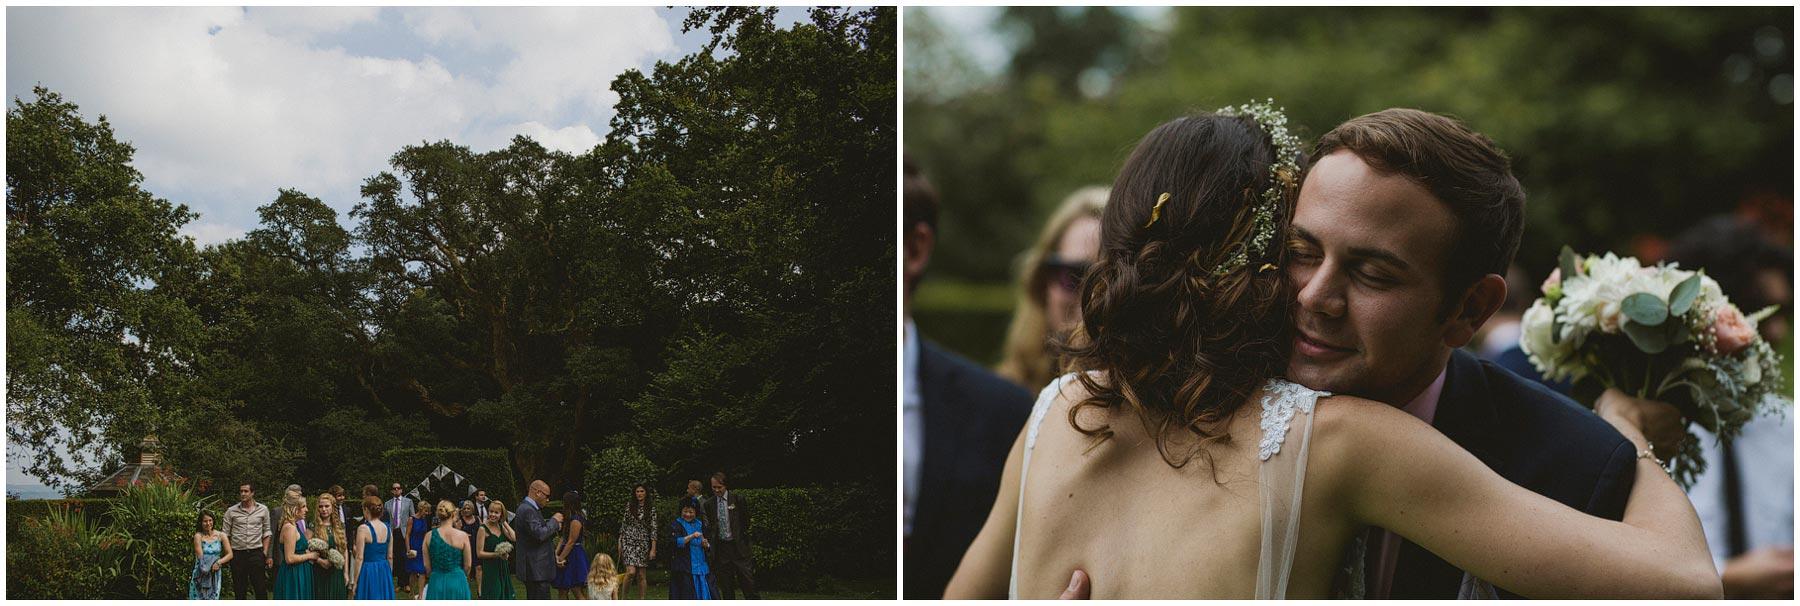 Colehayes-Park-Wedding-Photography_0103